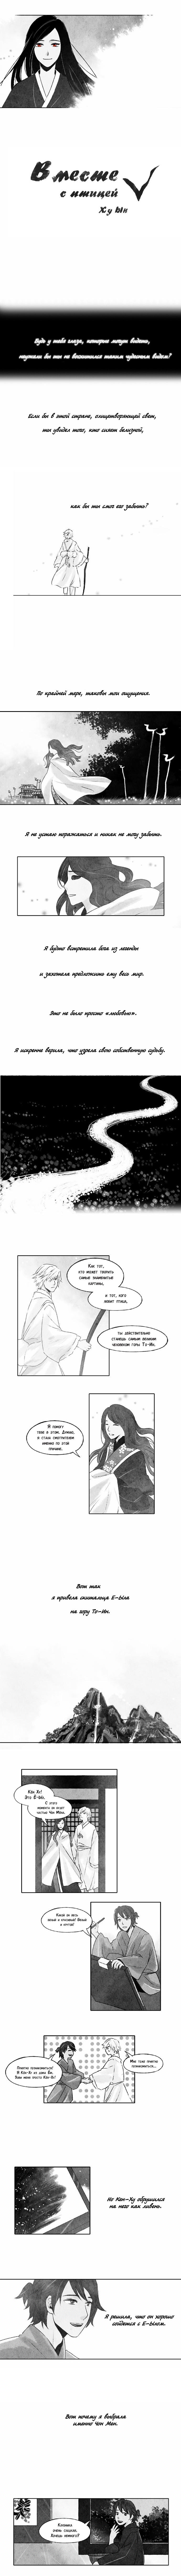 https://r1.ninemanga.com/comics/pic2/39/22503/416366/1532884205622.jpg Page 2